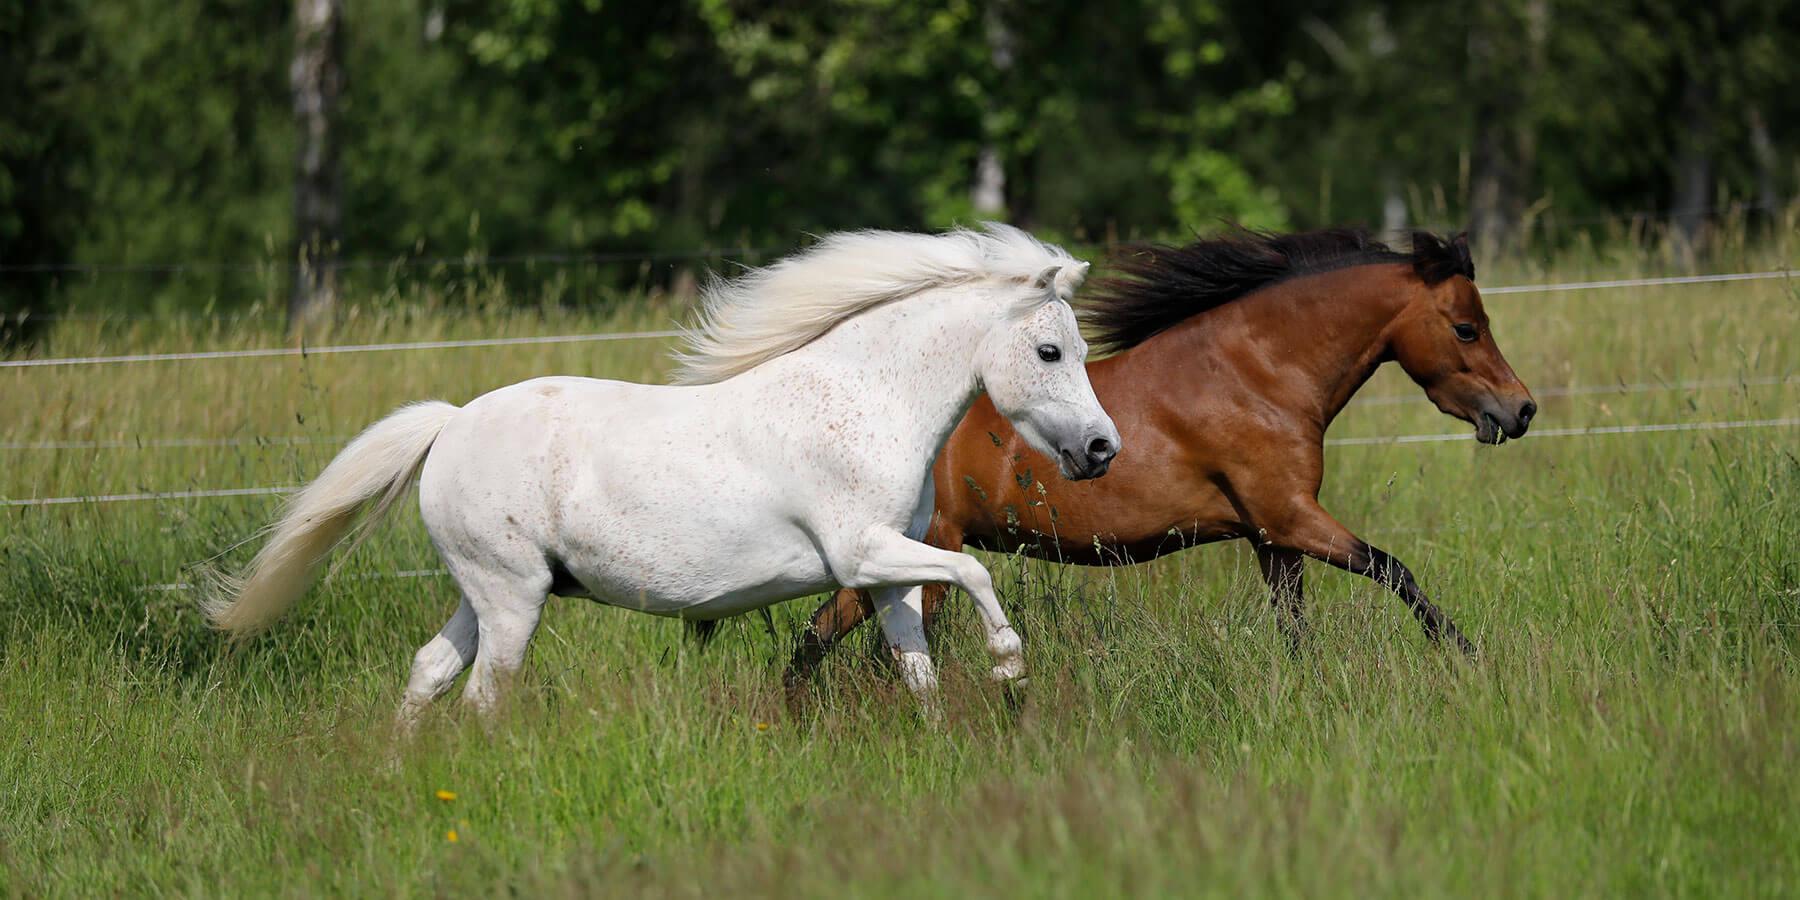 American Miniature Horse mares